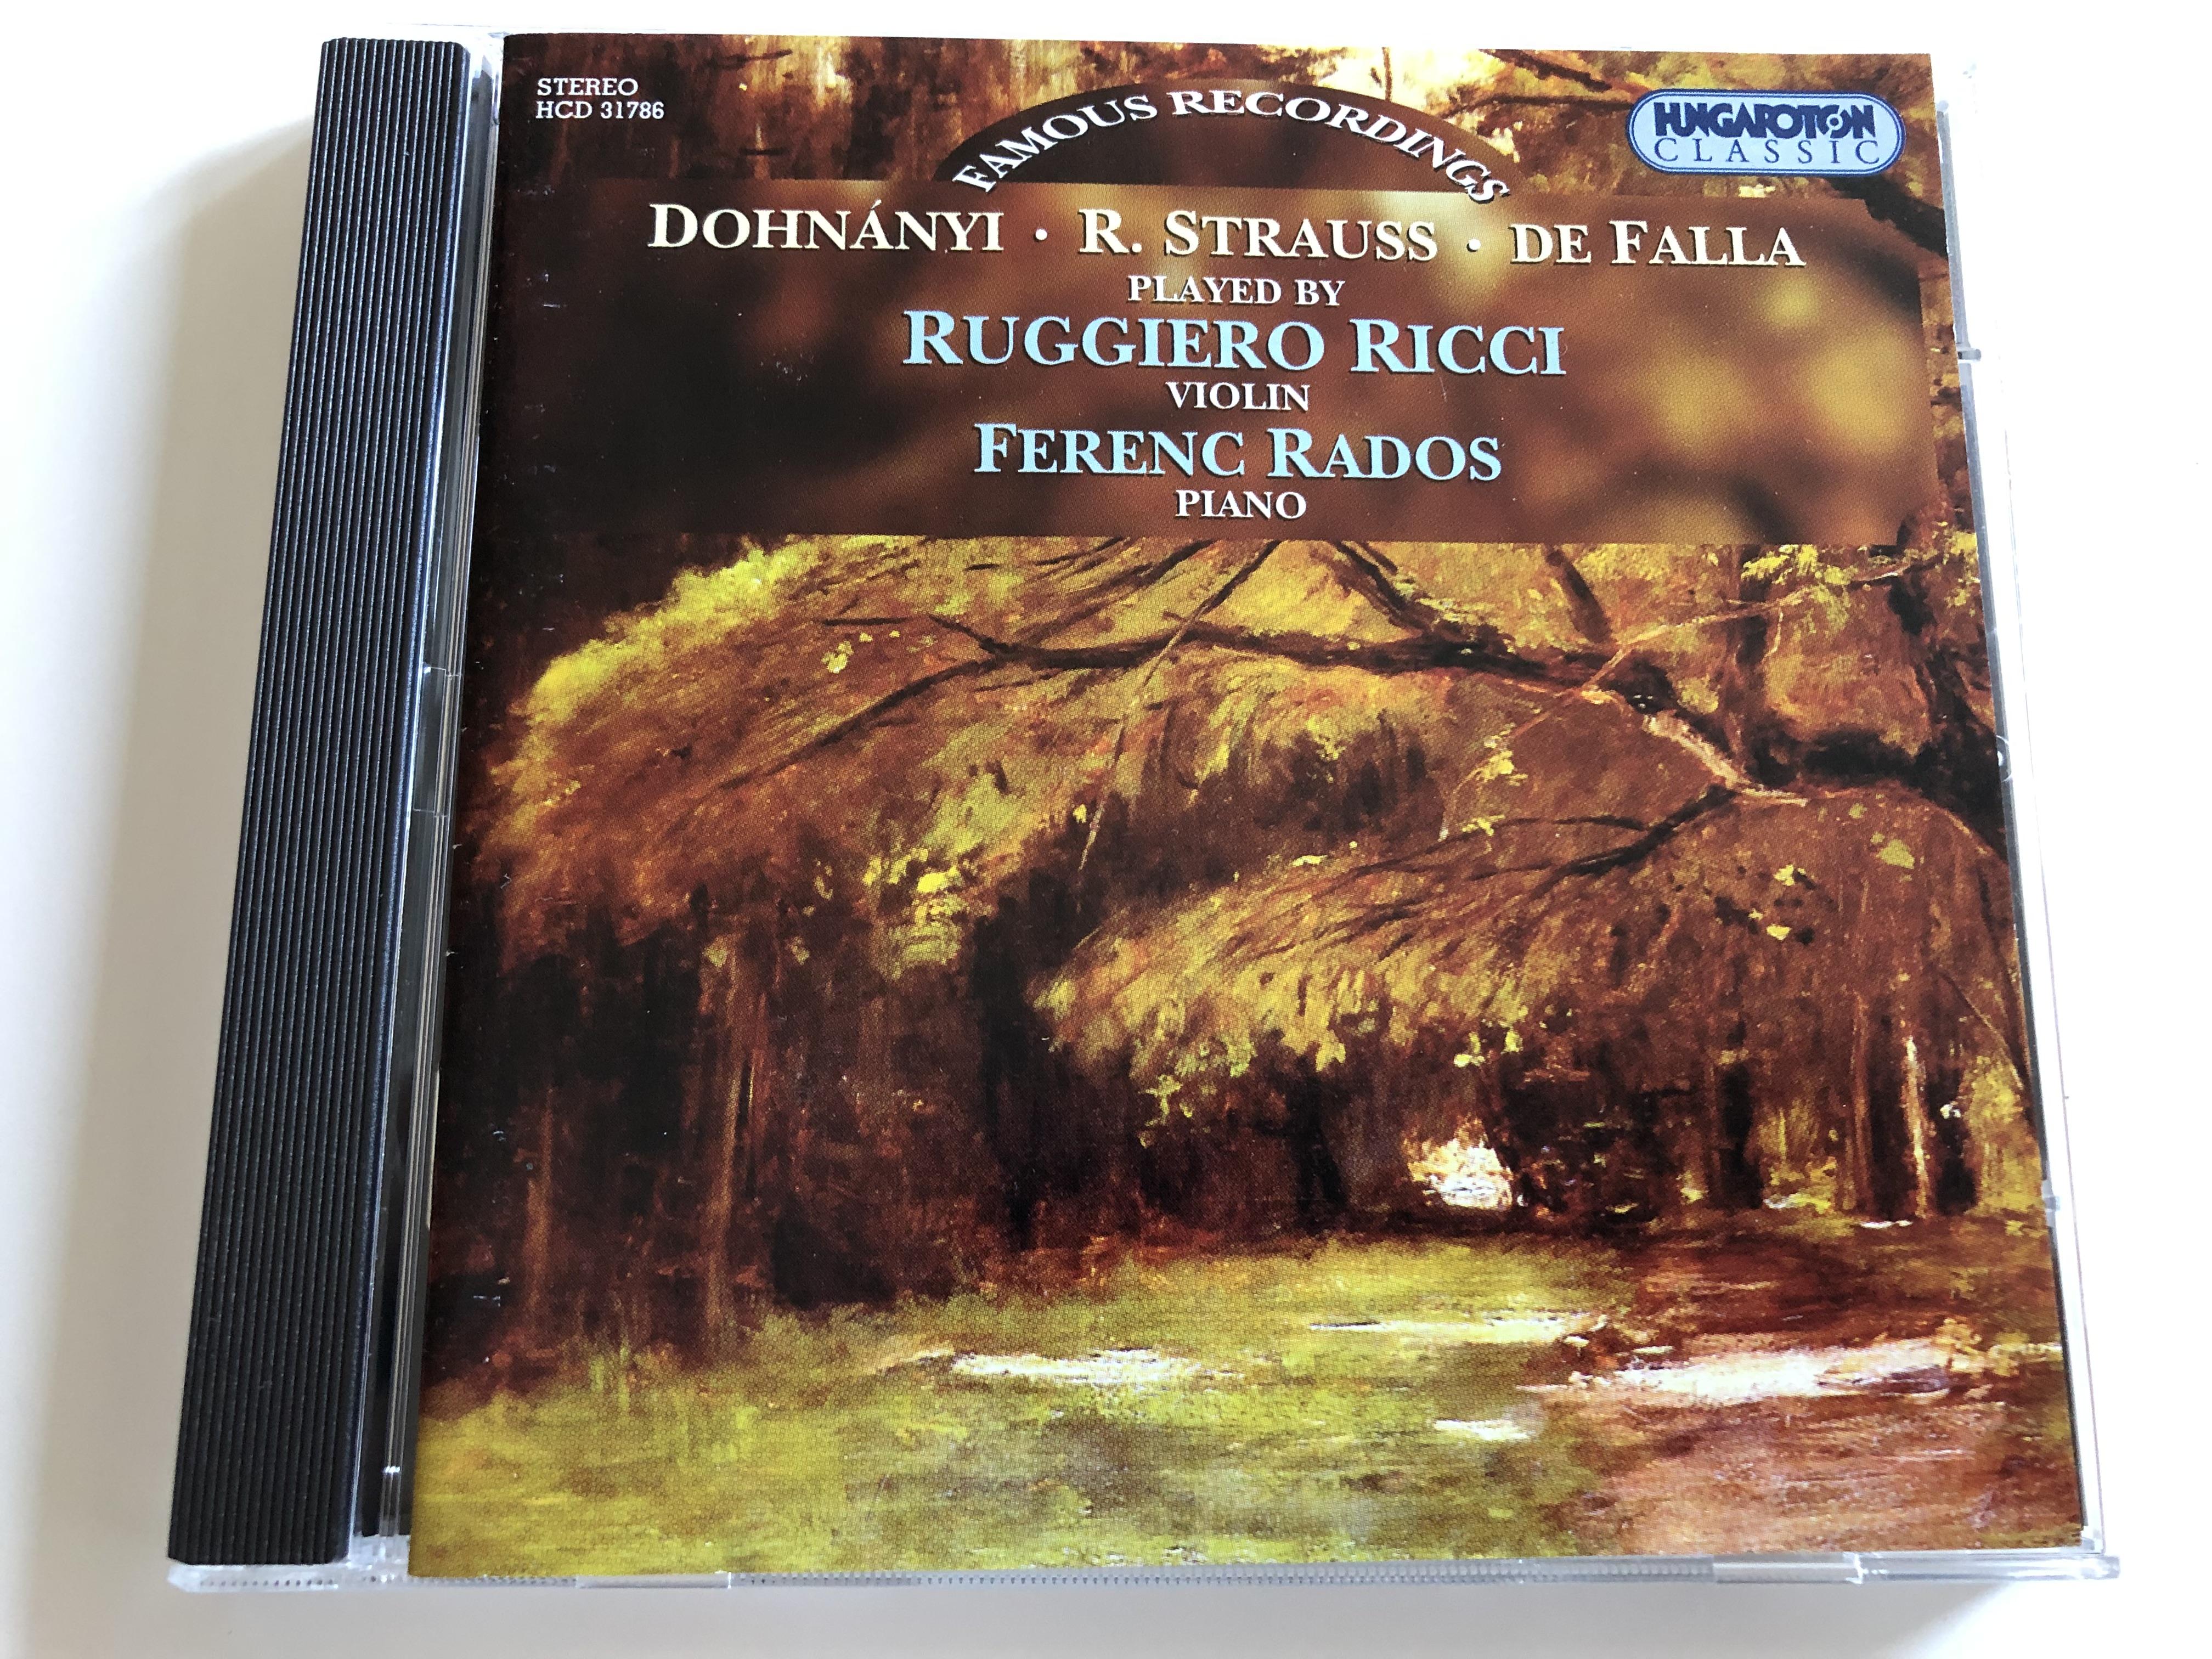 dohnanyi-r.-strauss-de-falla-played-by-ruggiero-ricci-violin-ferenc-rados-piano-hungaroton-classic-audio-cd-1999-stereo-hcd-31786-1-.jpg